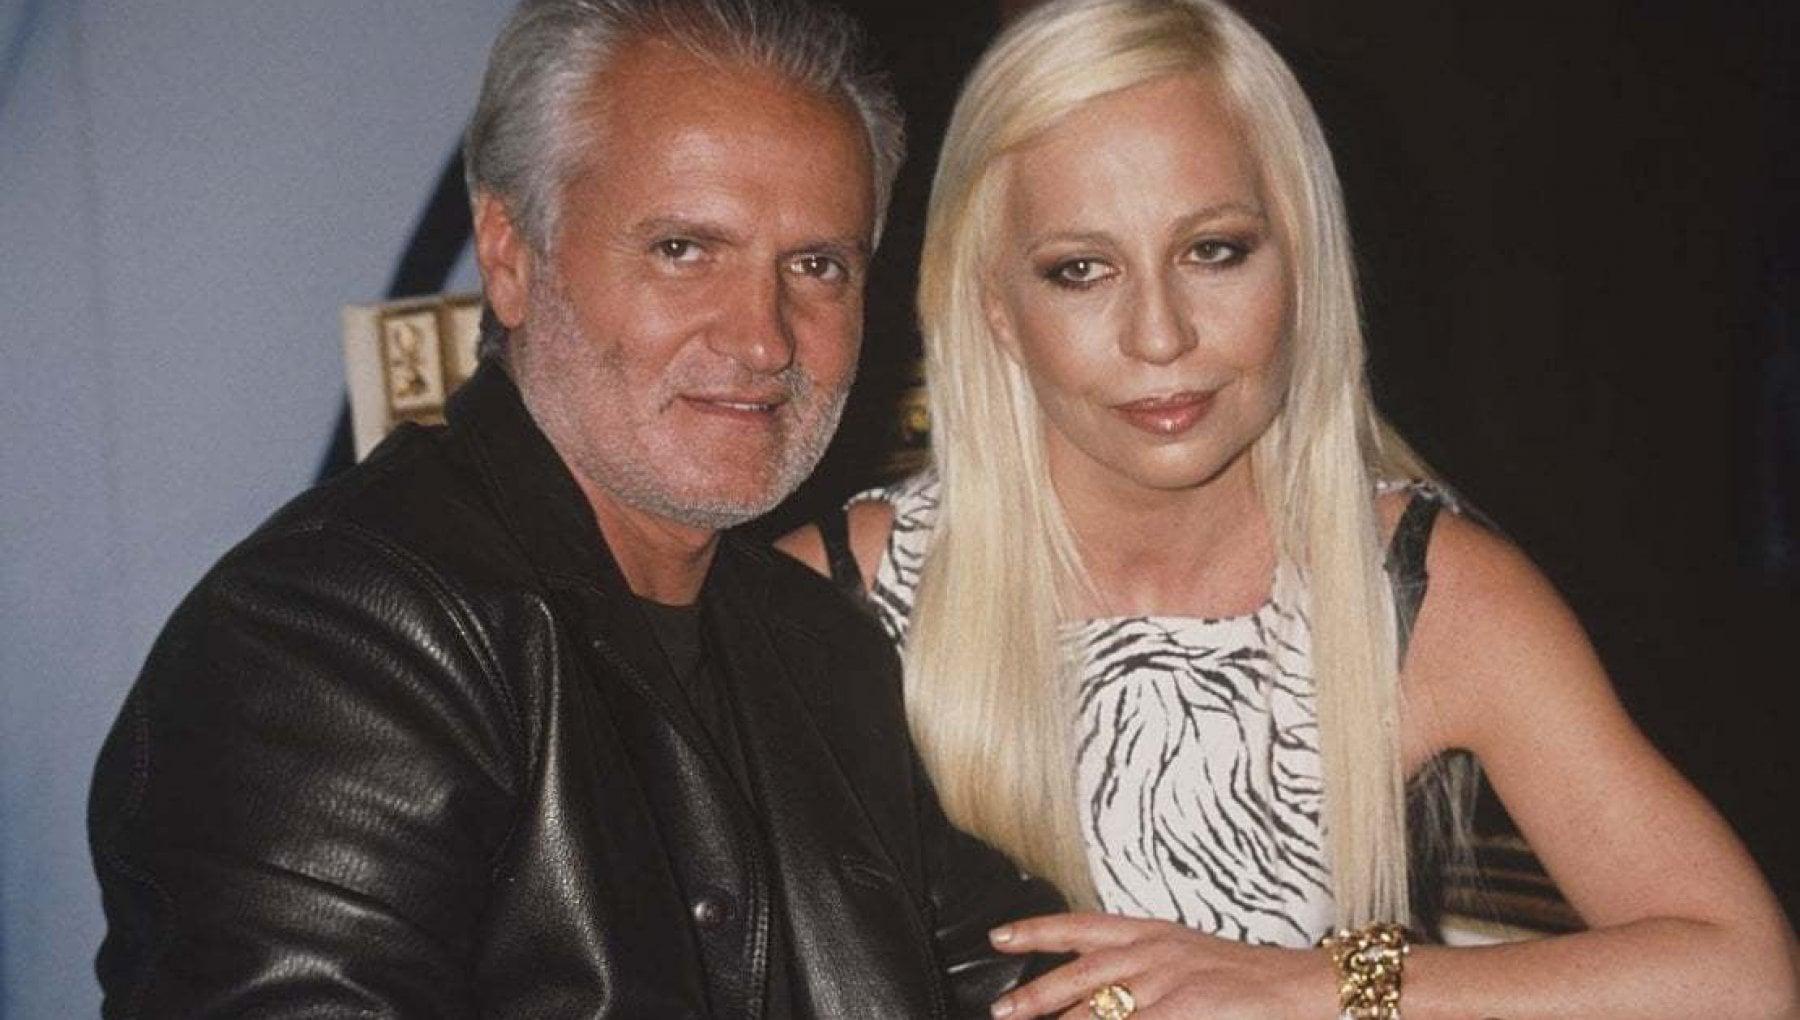 234621759 9a98e1b9 2ca4 4cb5 91e1 2d1f2fa6fb1f - Versace, morte a Miami